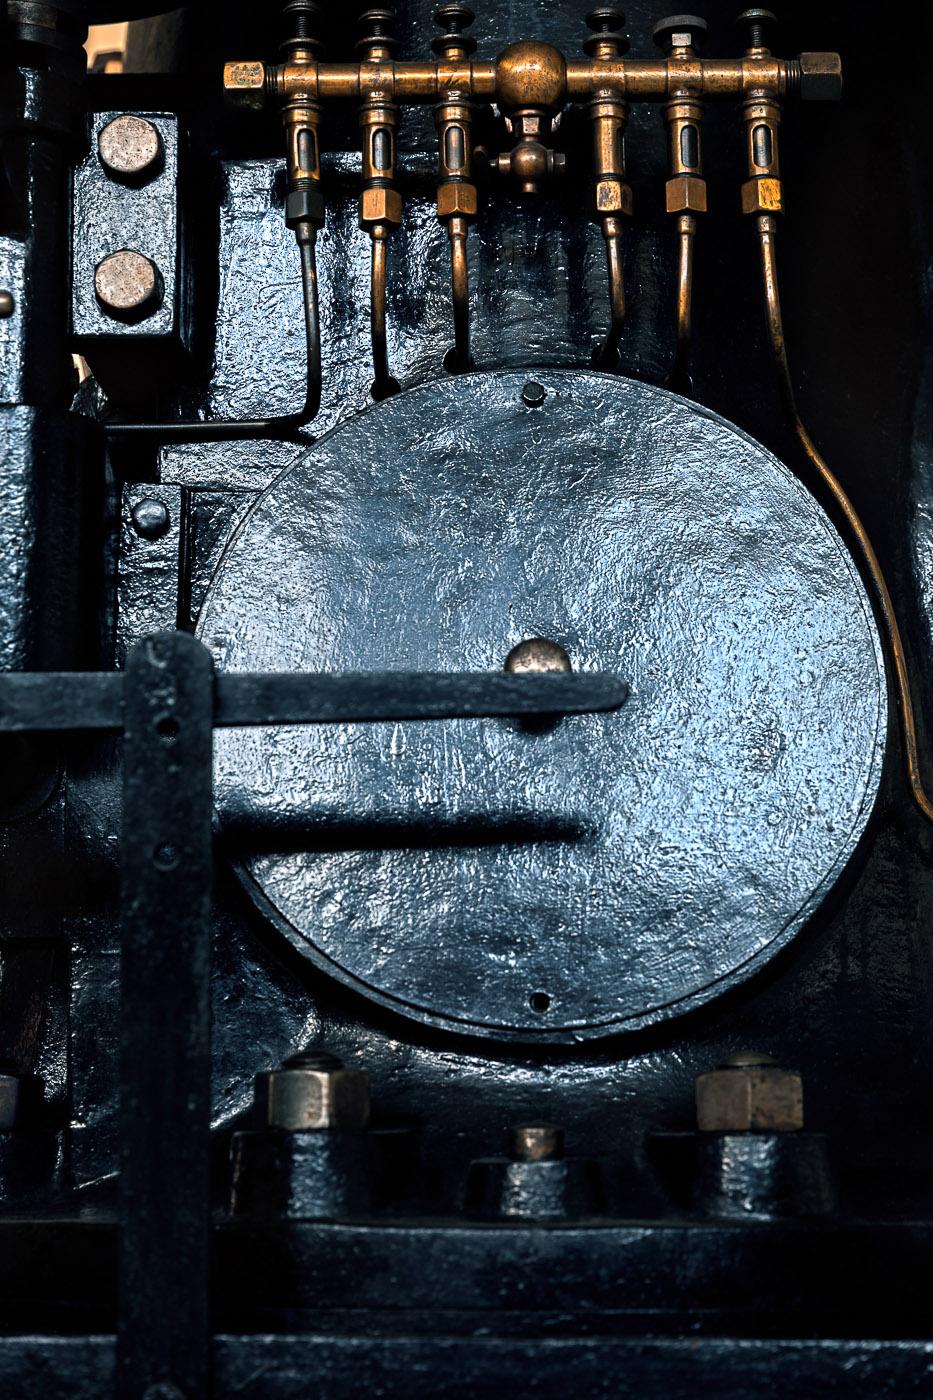 engine deutz historic